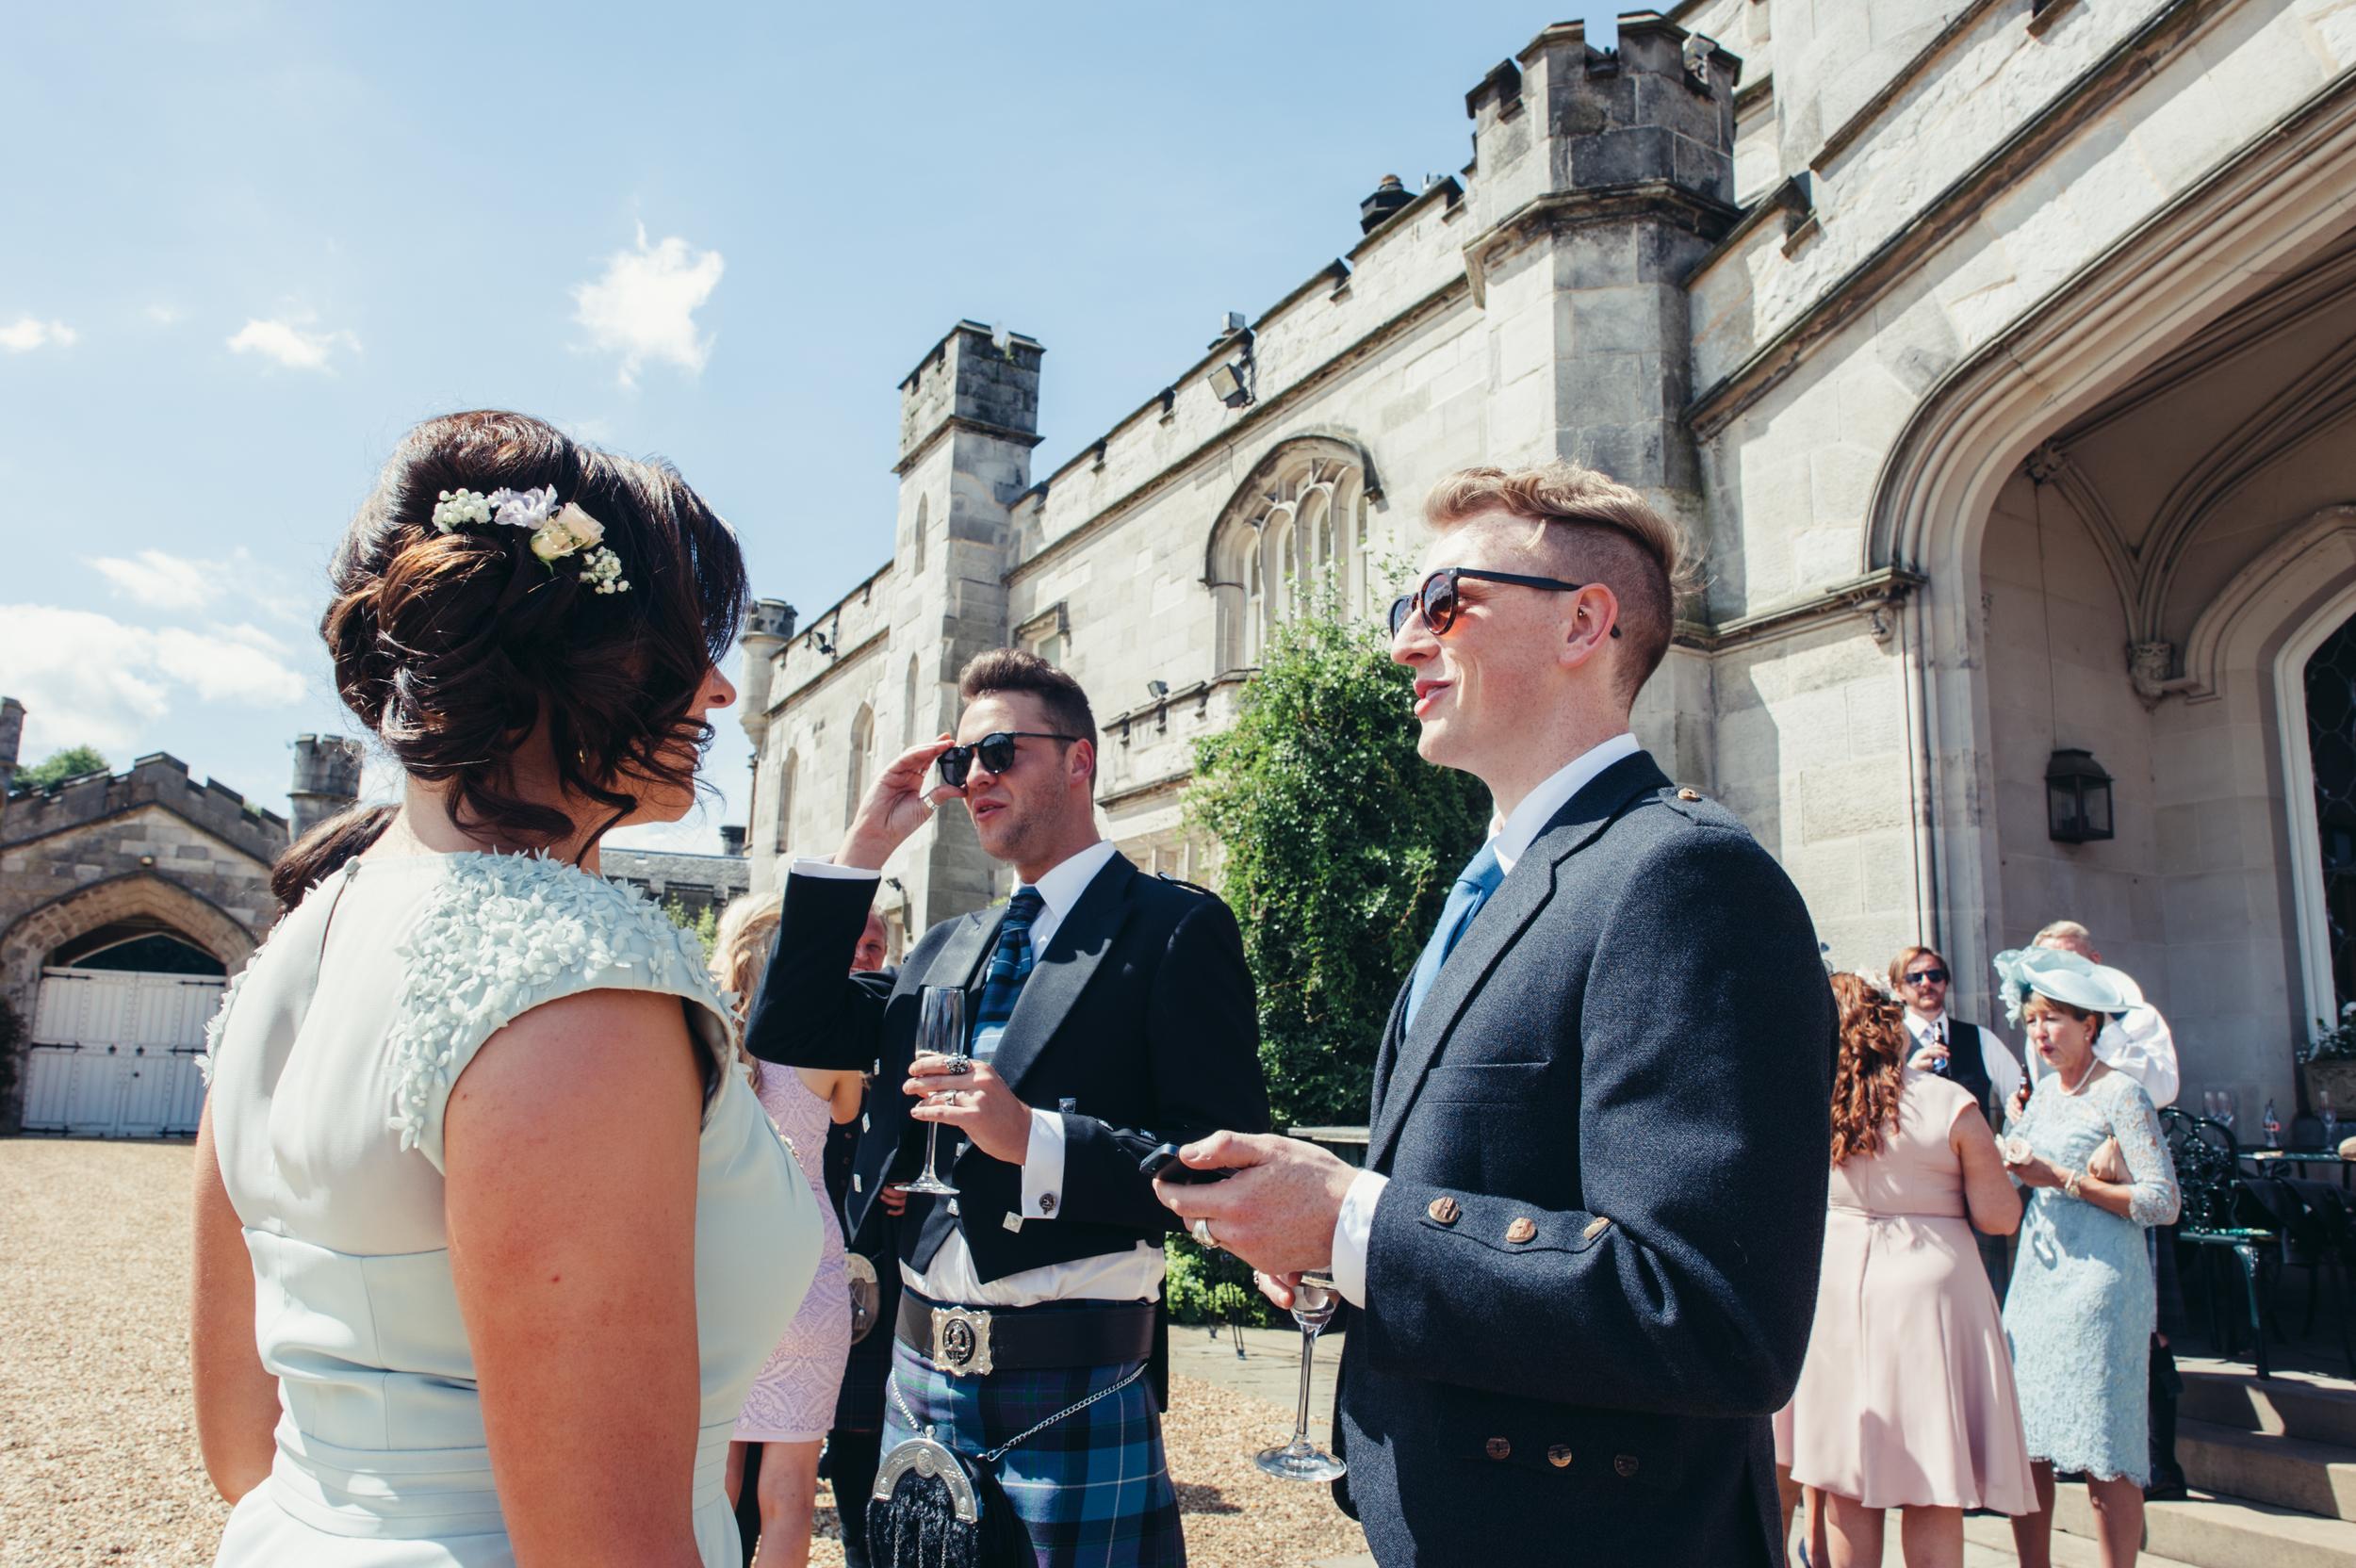 0121-lisa-devine-alternative-creative-wedding-photography-glasgow-edinburgh.JPG